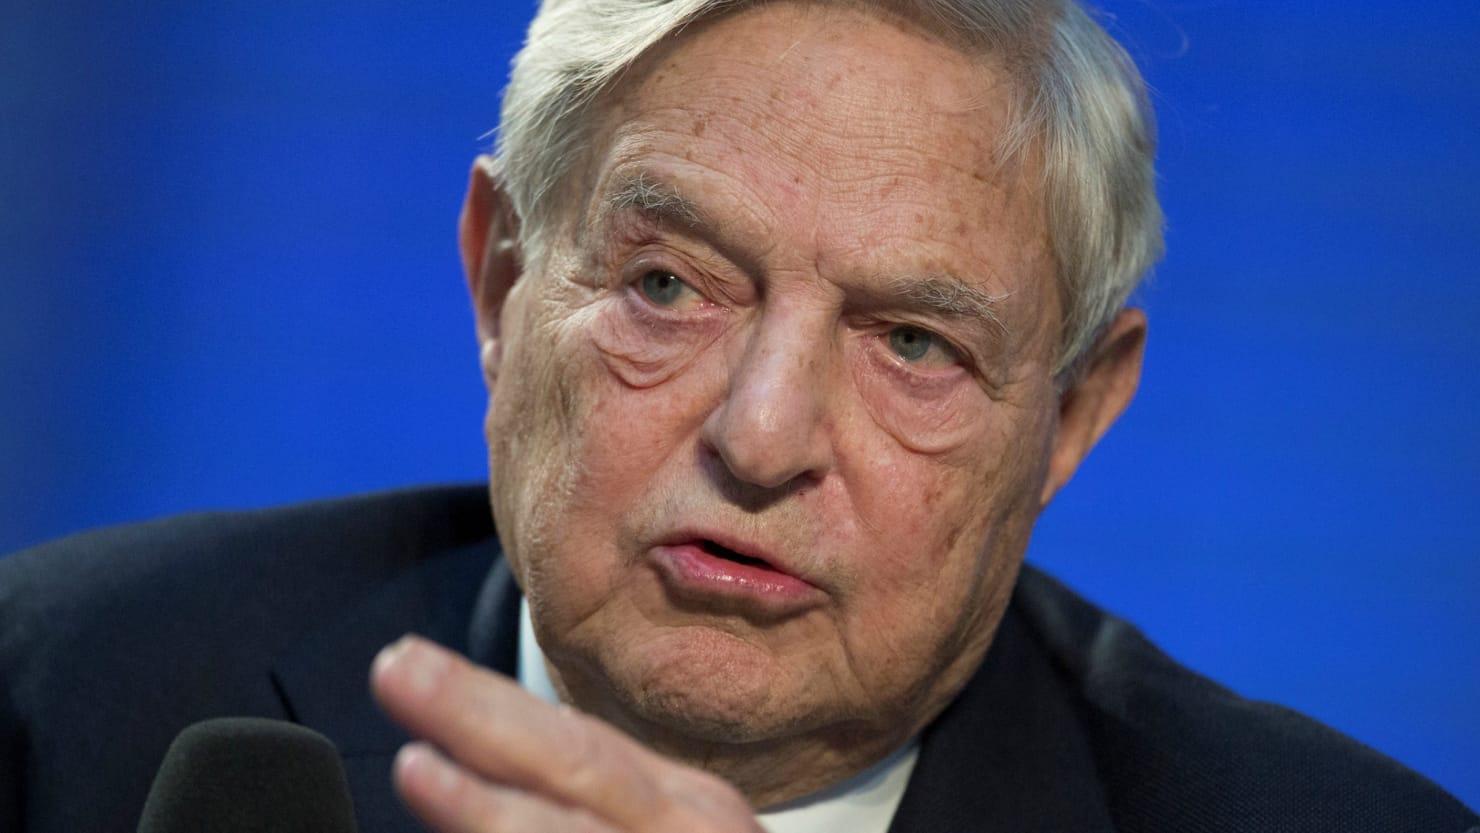 Caesars investor George Soros slams Facebook for being like a casino